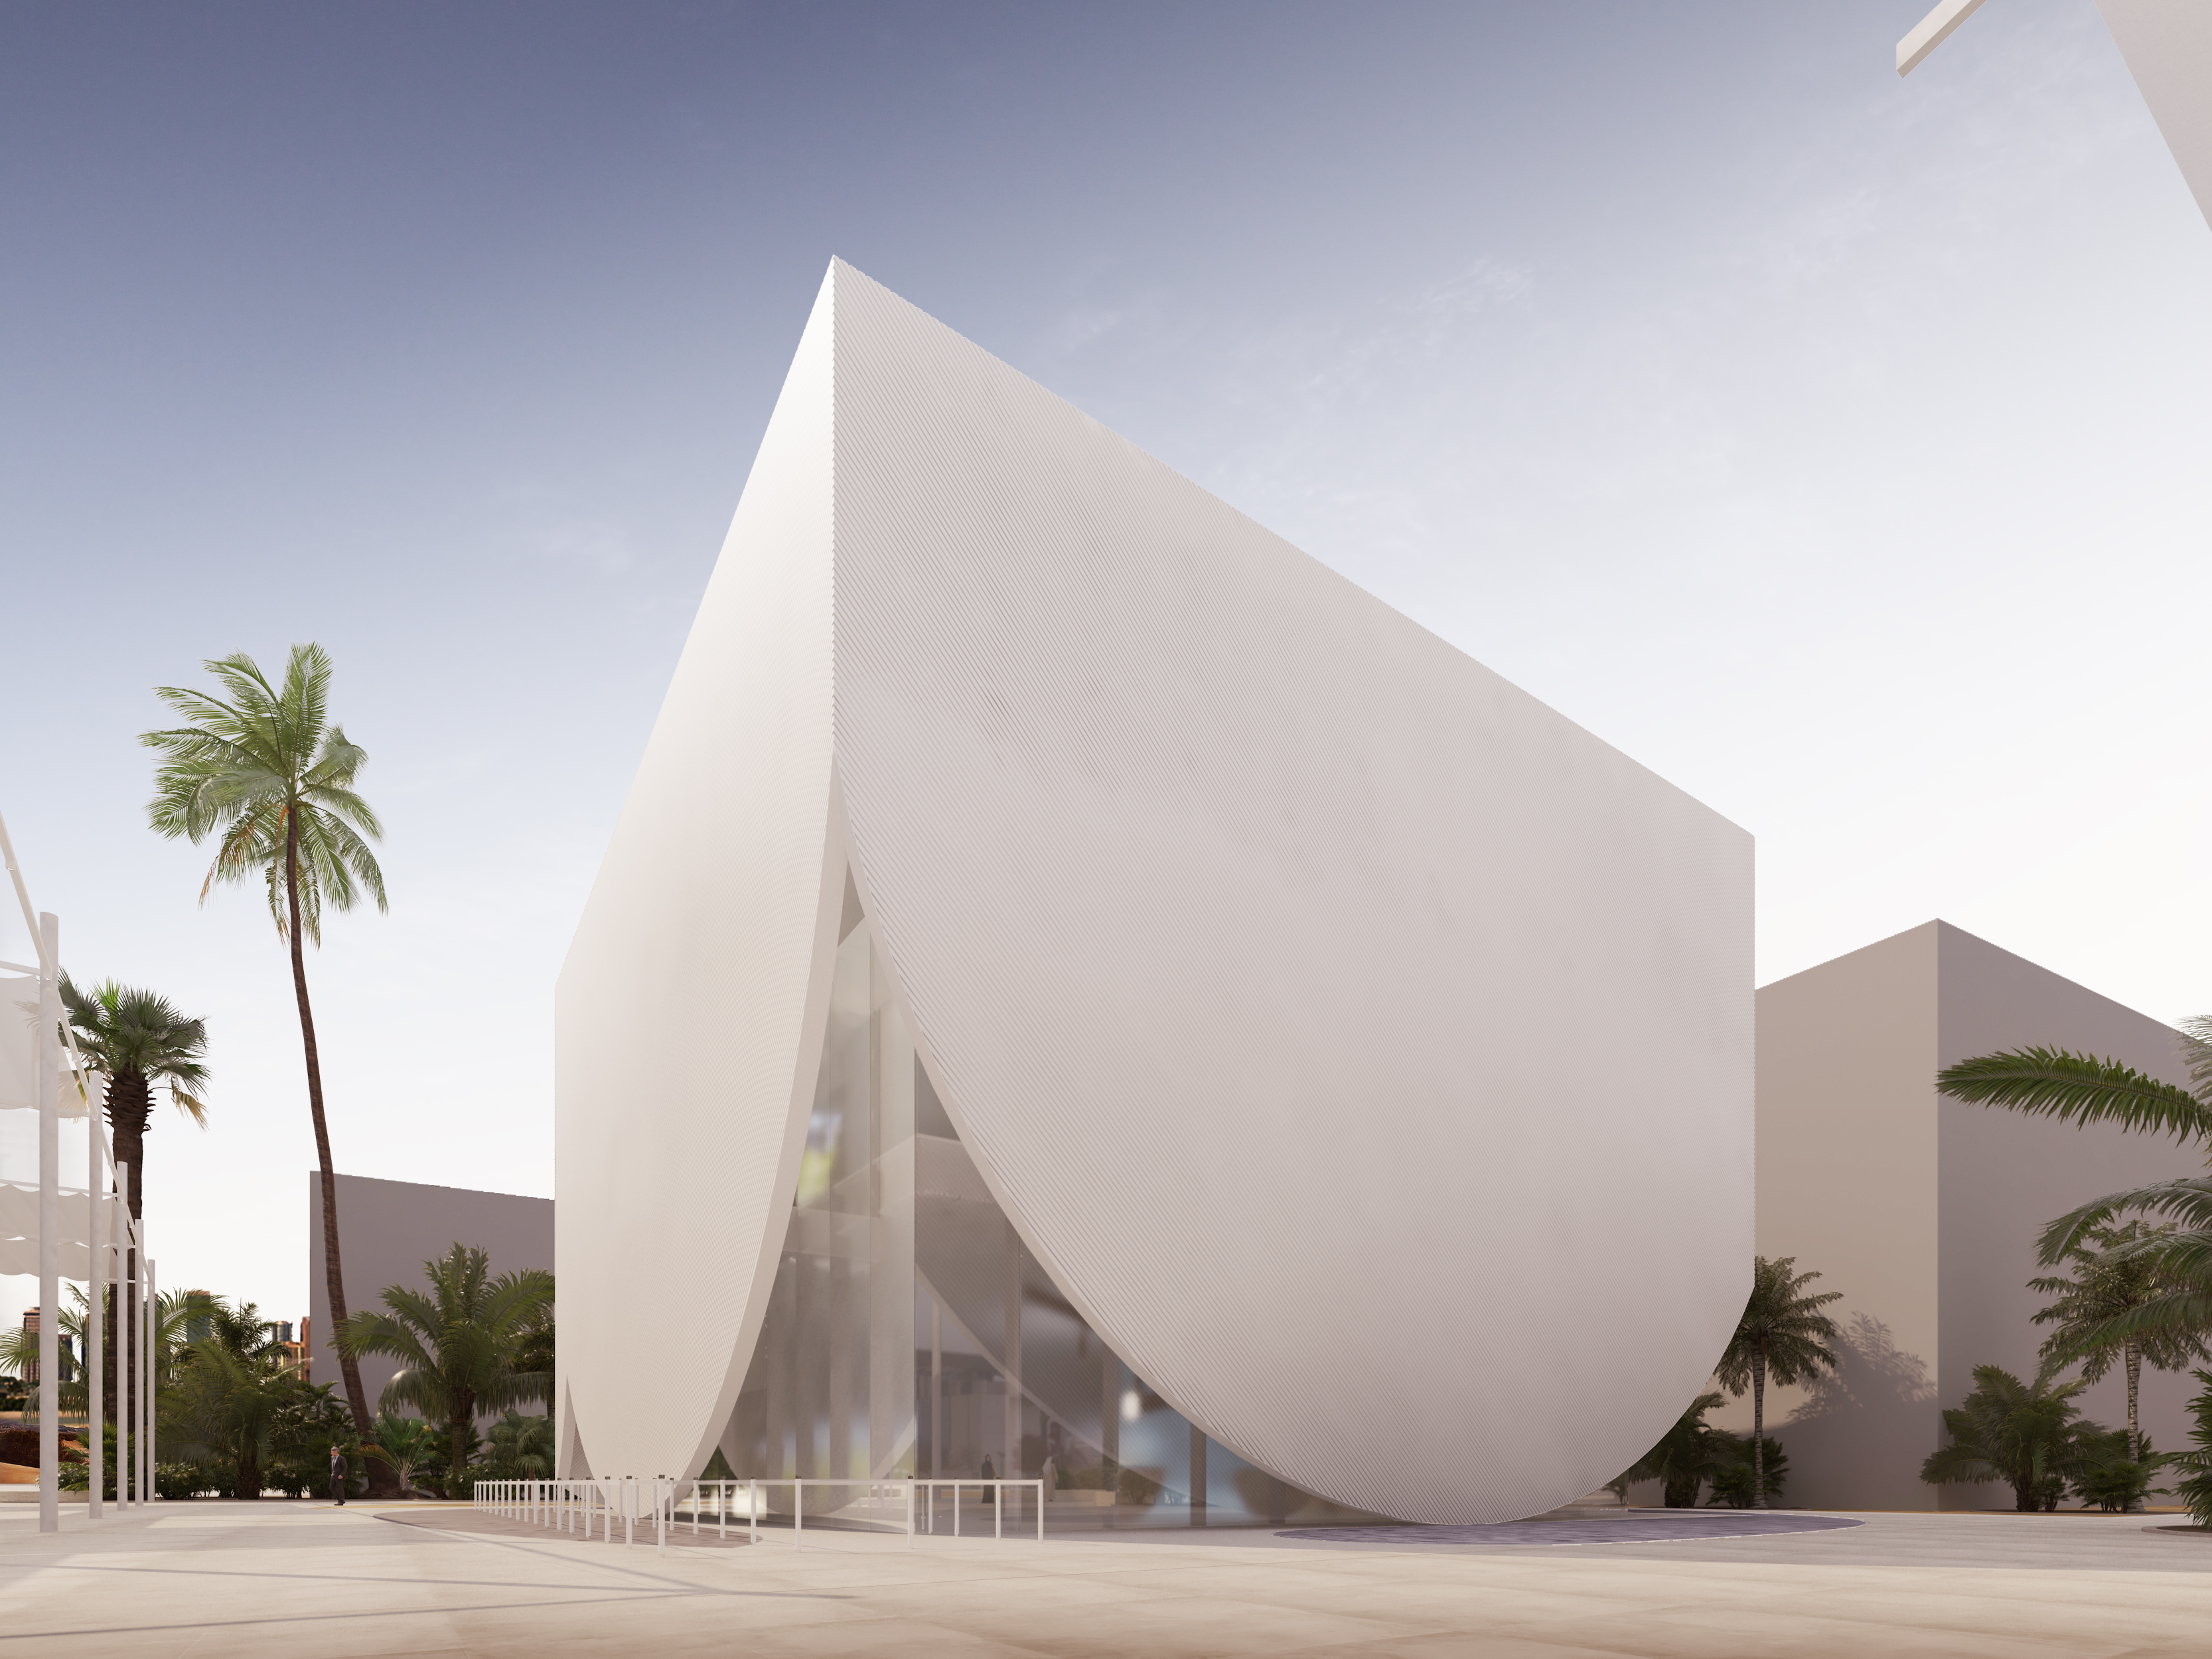 Romania's National Pavilion concept for Expo Dubai 2020 image